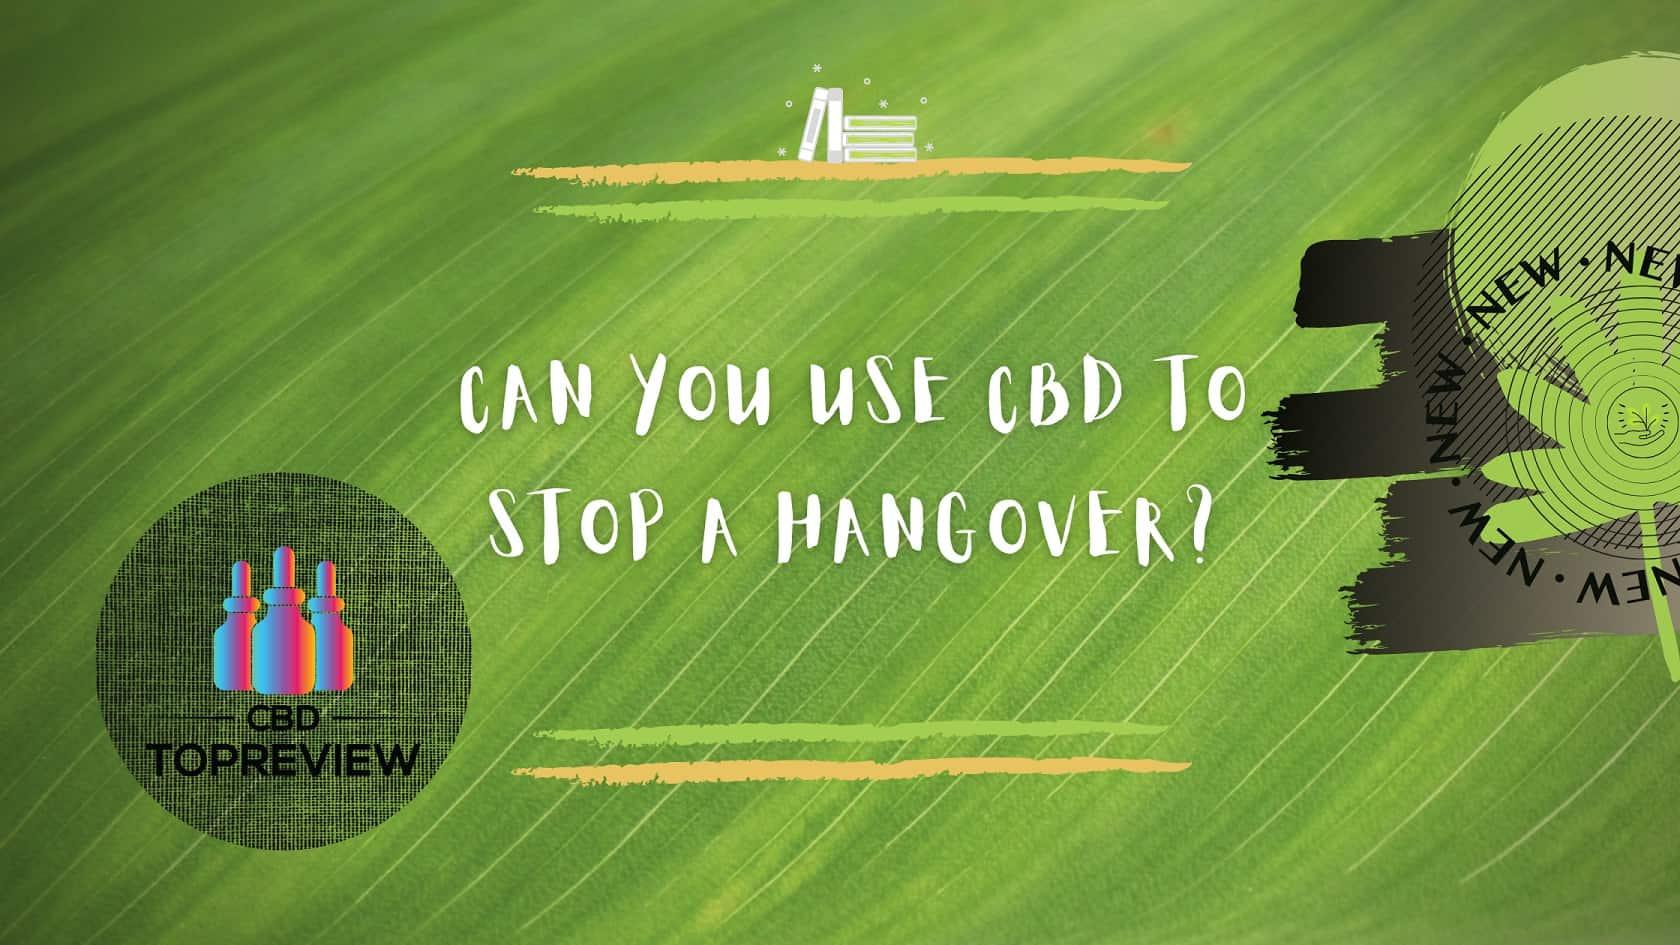 CBD stops hangover